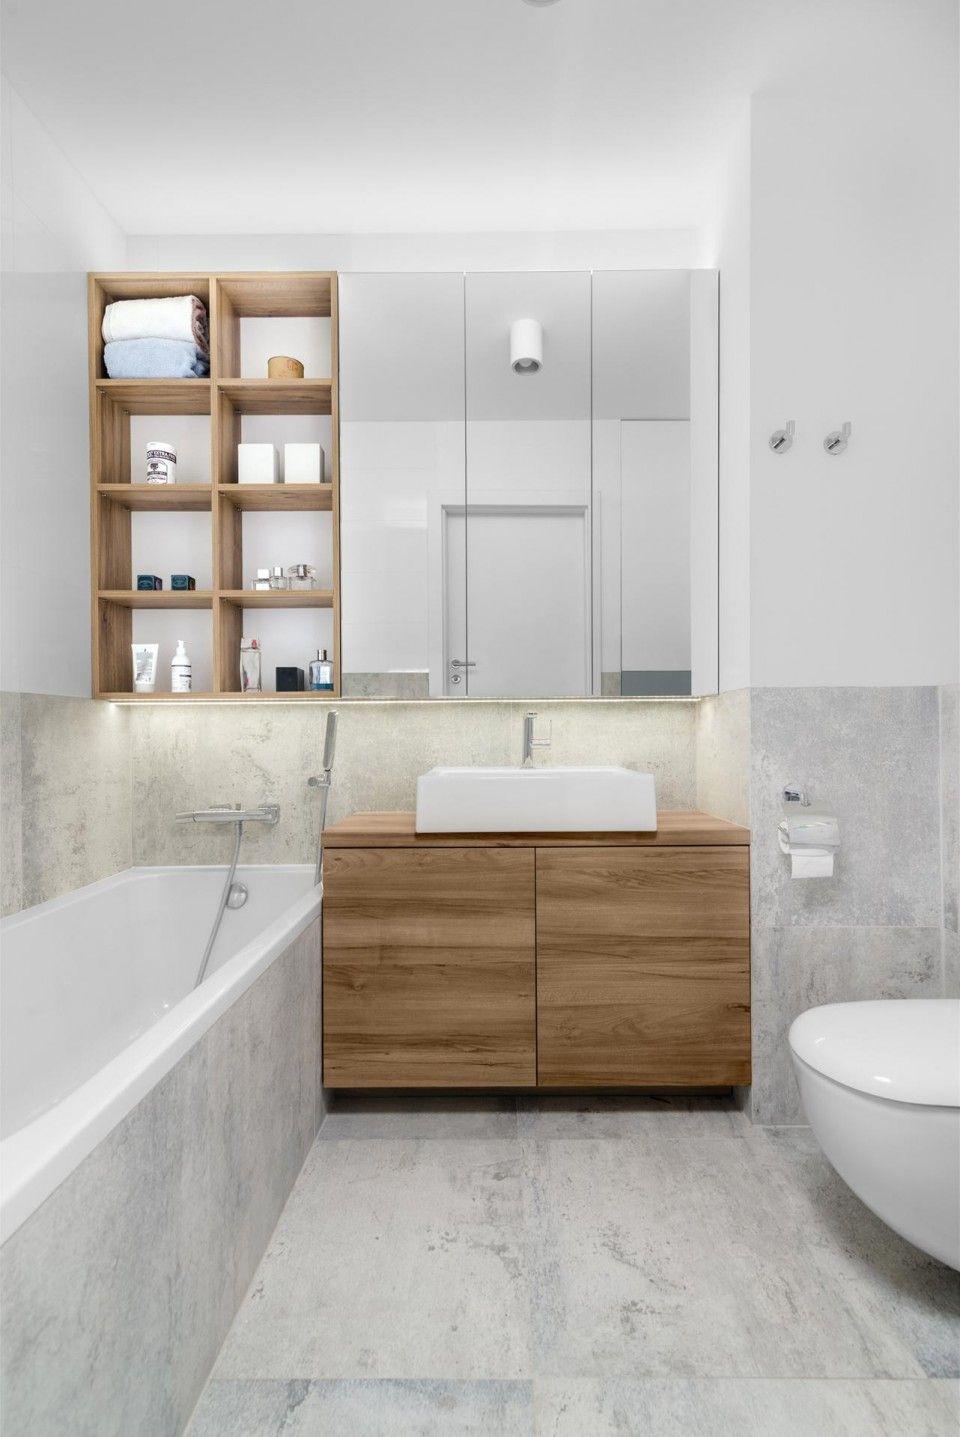 Badezimmer ideen klein grau marvipolatelier apartament dla młodych  badezimmer  pinterest